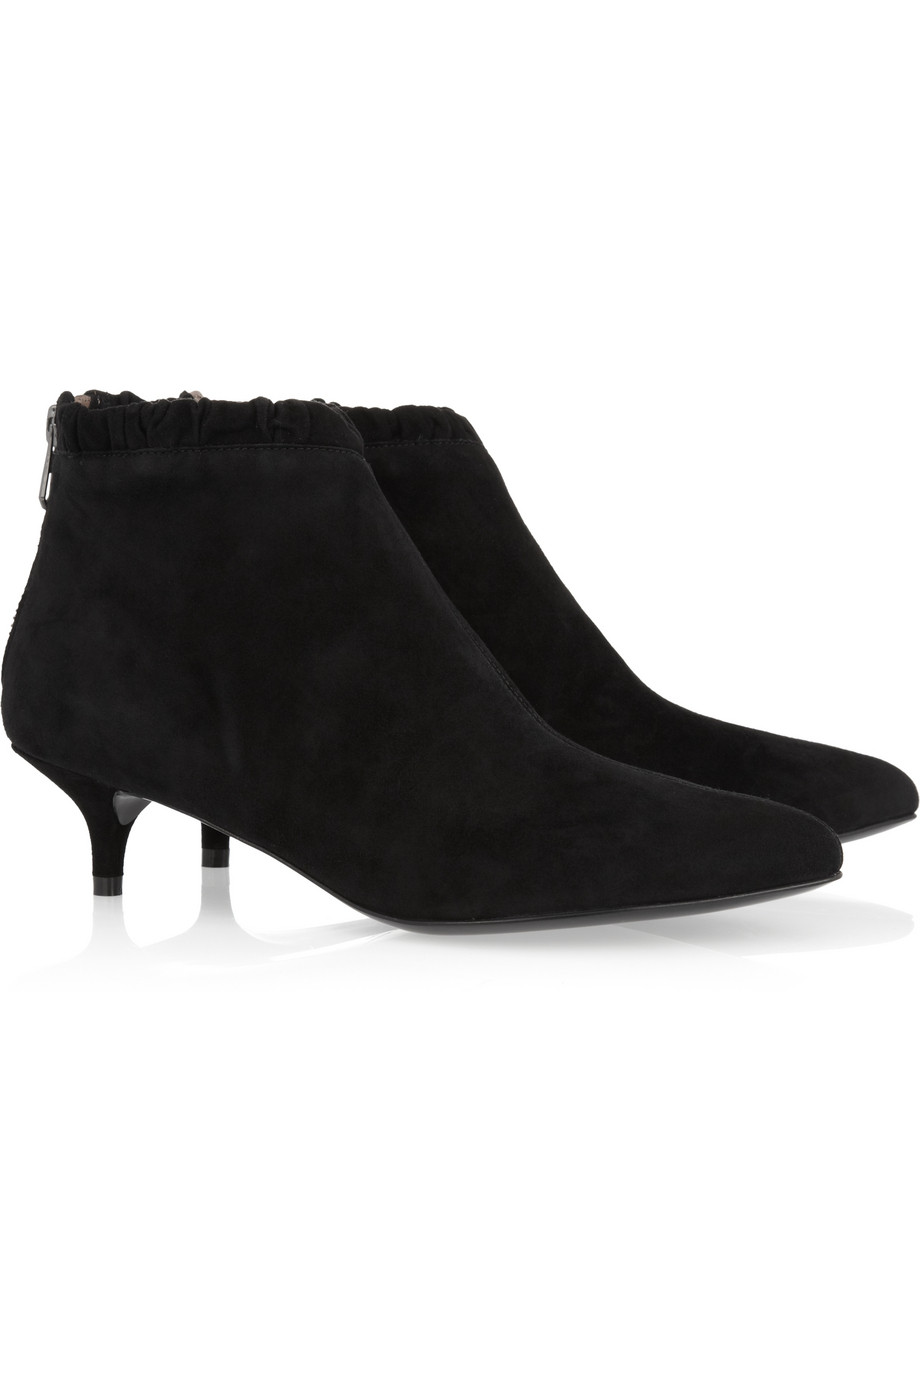 Sigerson Morrison Suede Kitten Heel Ankle Boots In Black